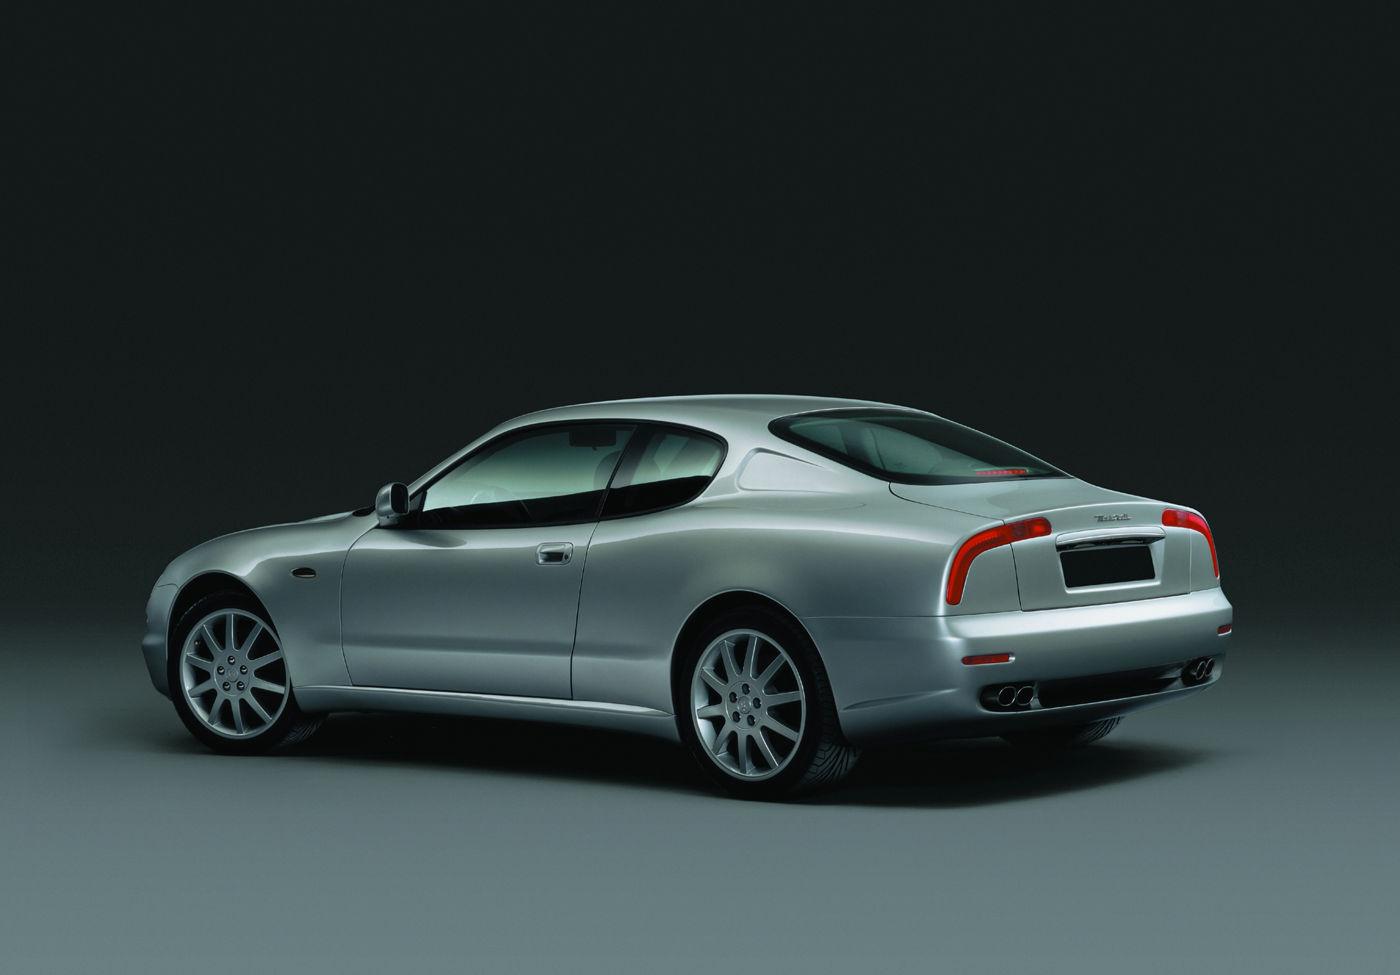 Maserati Classic - GranTurismo 3200 - carrosserie blanche - vue latérale postérieure